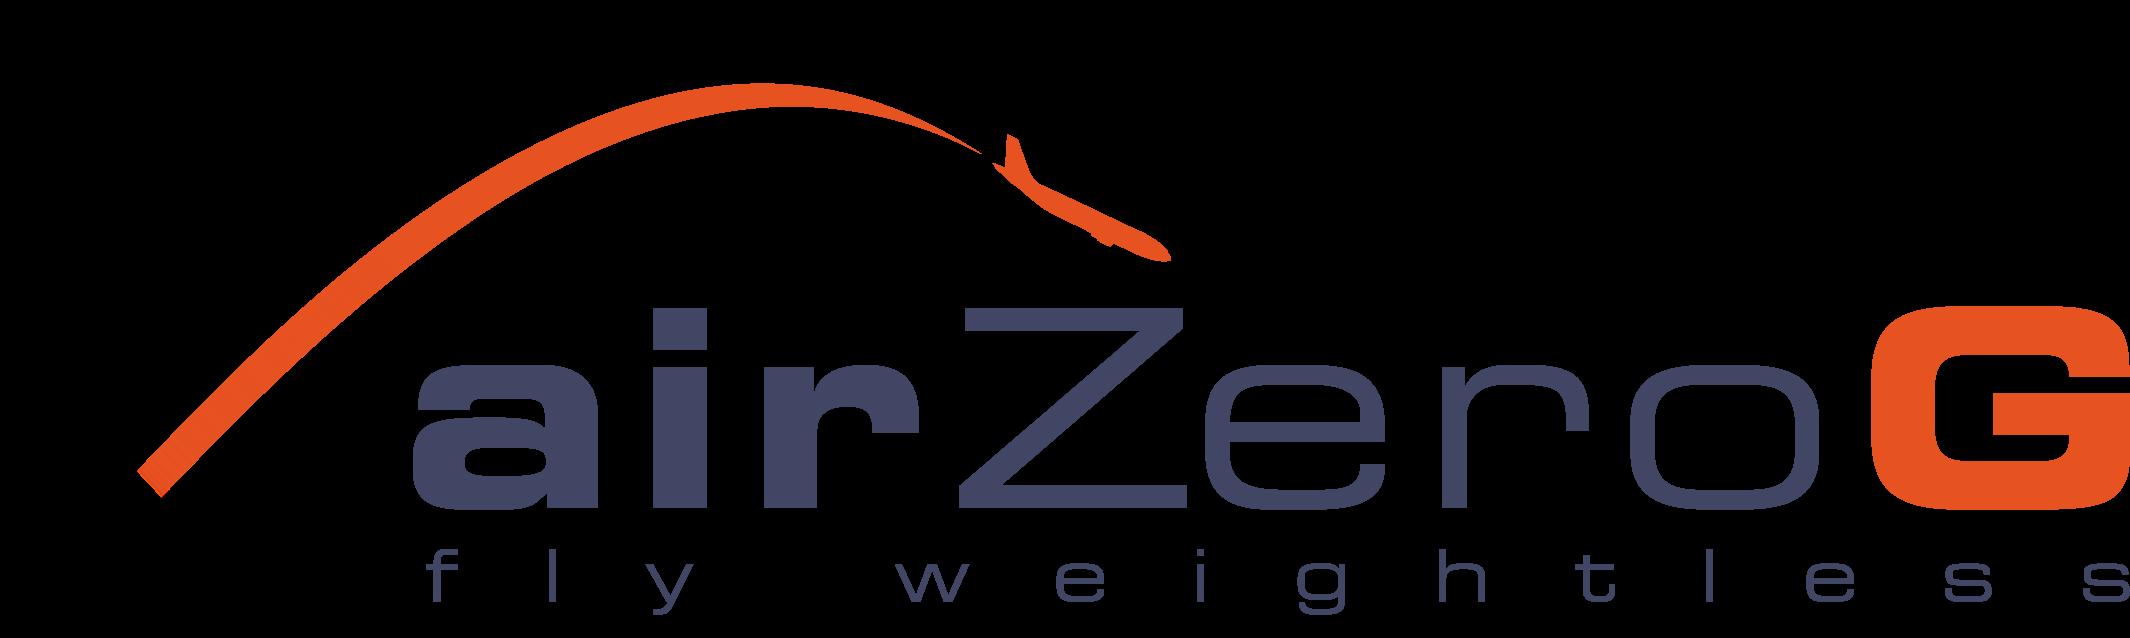 Sponsors_pklihwy5ze6qm6clc_logo_airzero-g